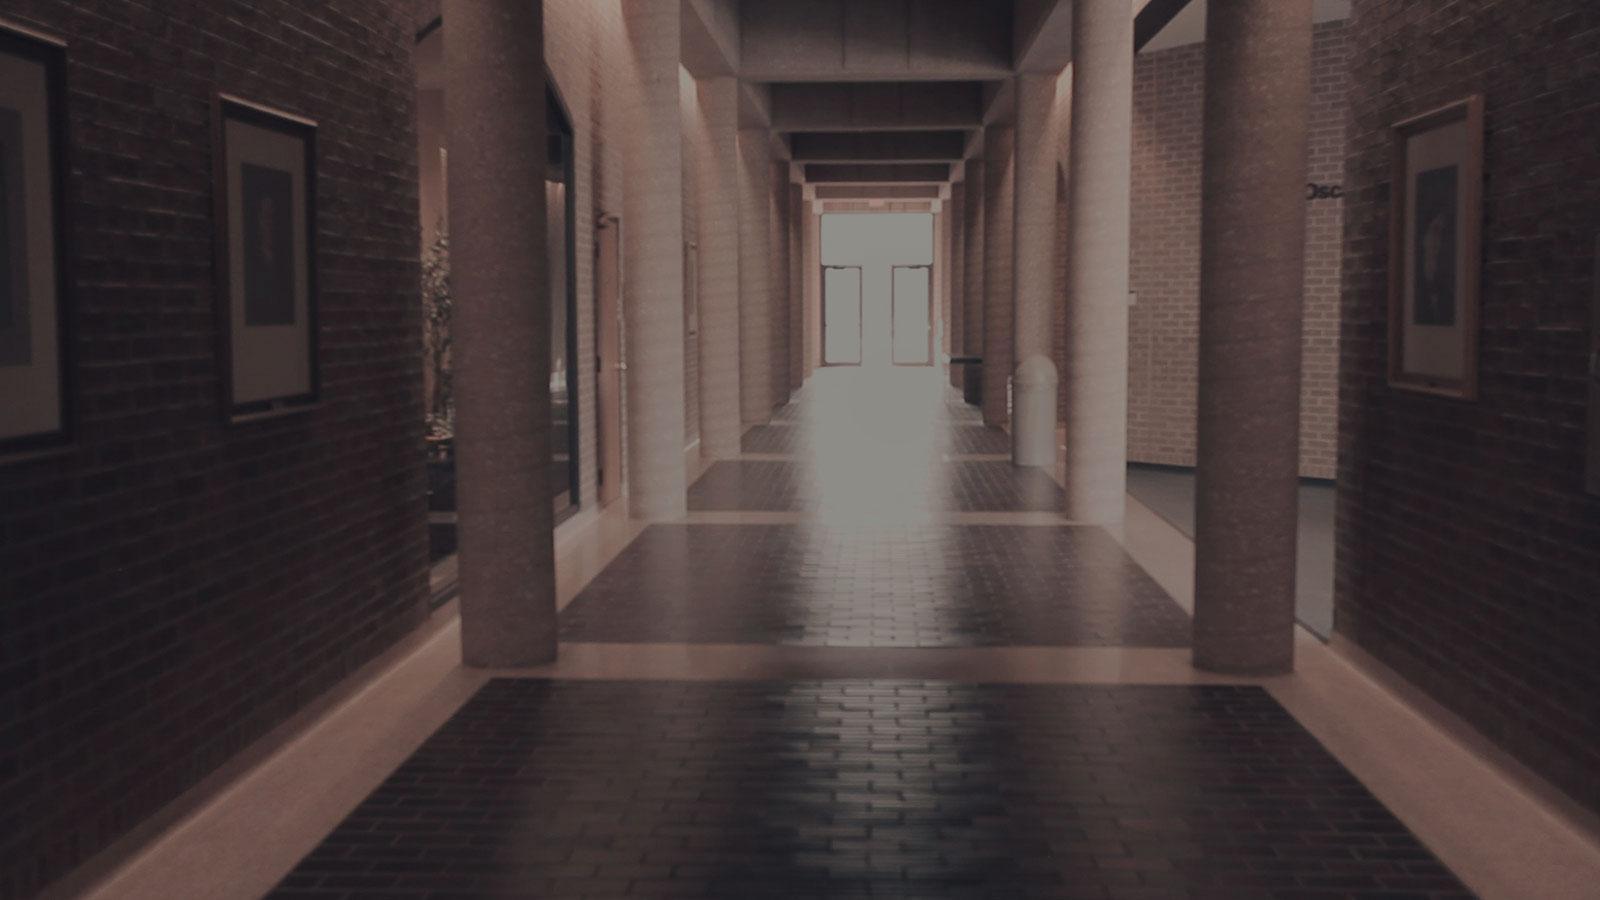 Hallway at the Nebraska College of Law